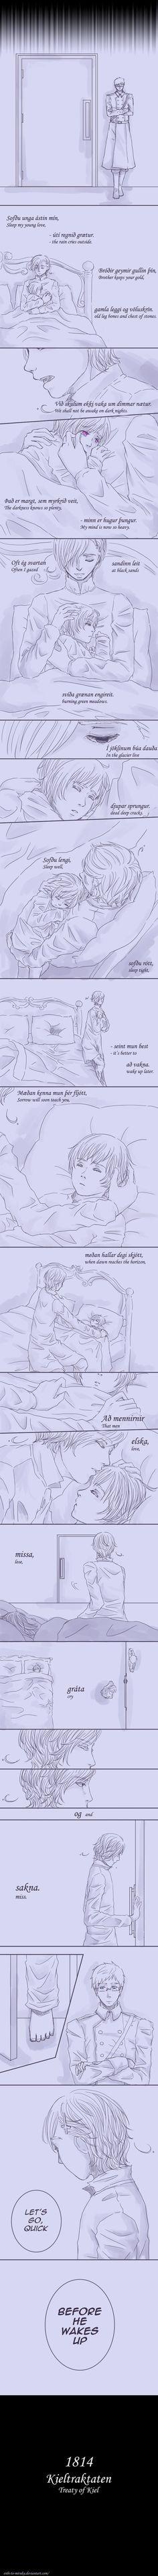 [APH Nordics] Sleep my young love by Enbi-to-Miruku.deviantart.com on @deviantART (i think my heart is dead)